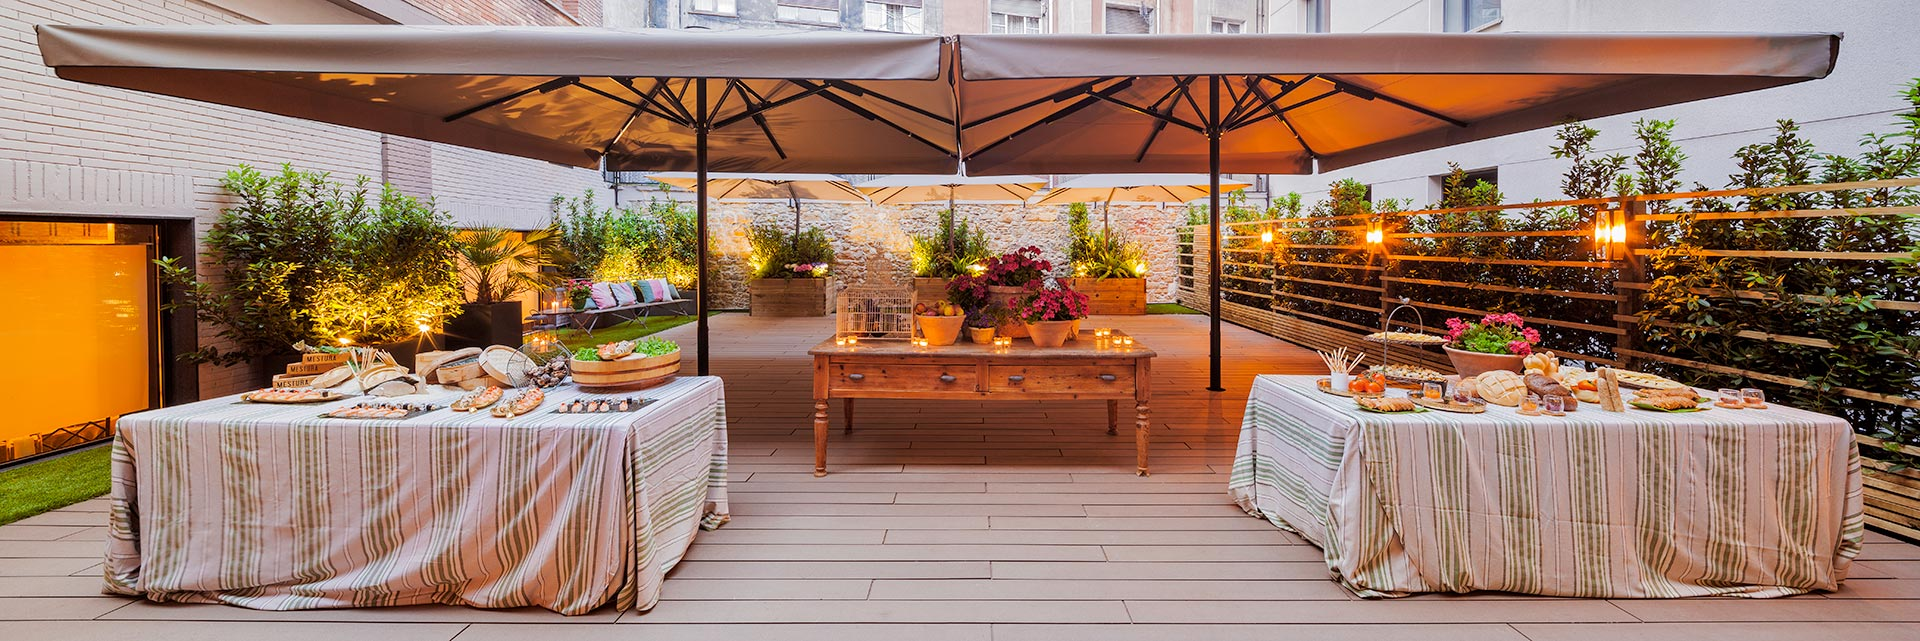 Weddings And Events For Companies In Oviedo # Salon De Jardin Oviedo